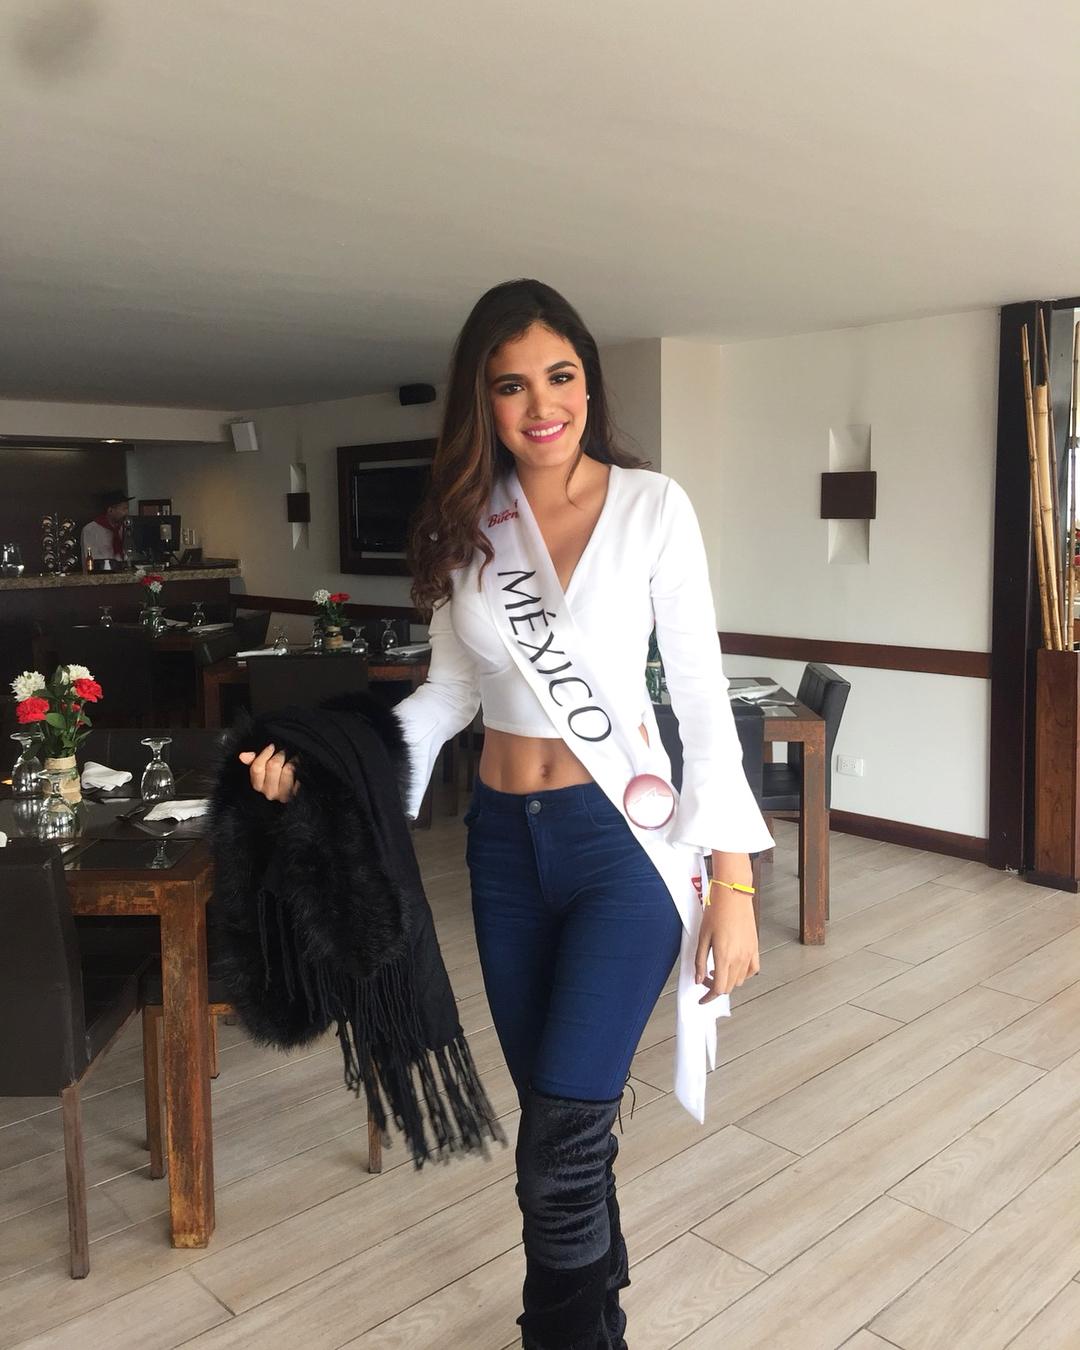 phegda bustillos, miss mexico para reinado inernacional cafe 2018. - Página 3 26070683_178803406052415_2053829927605633024_n